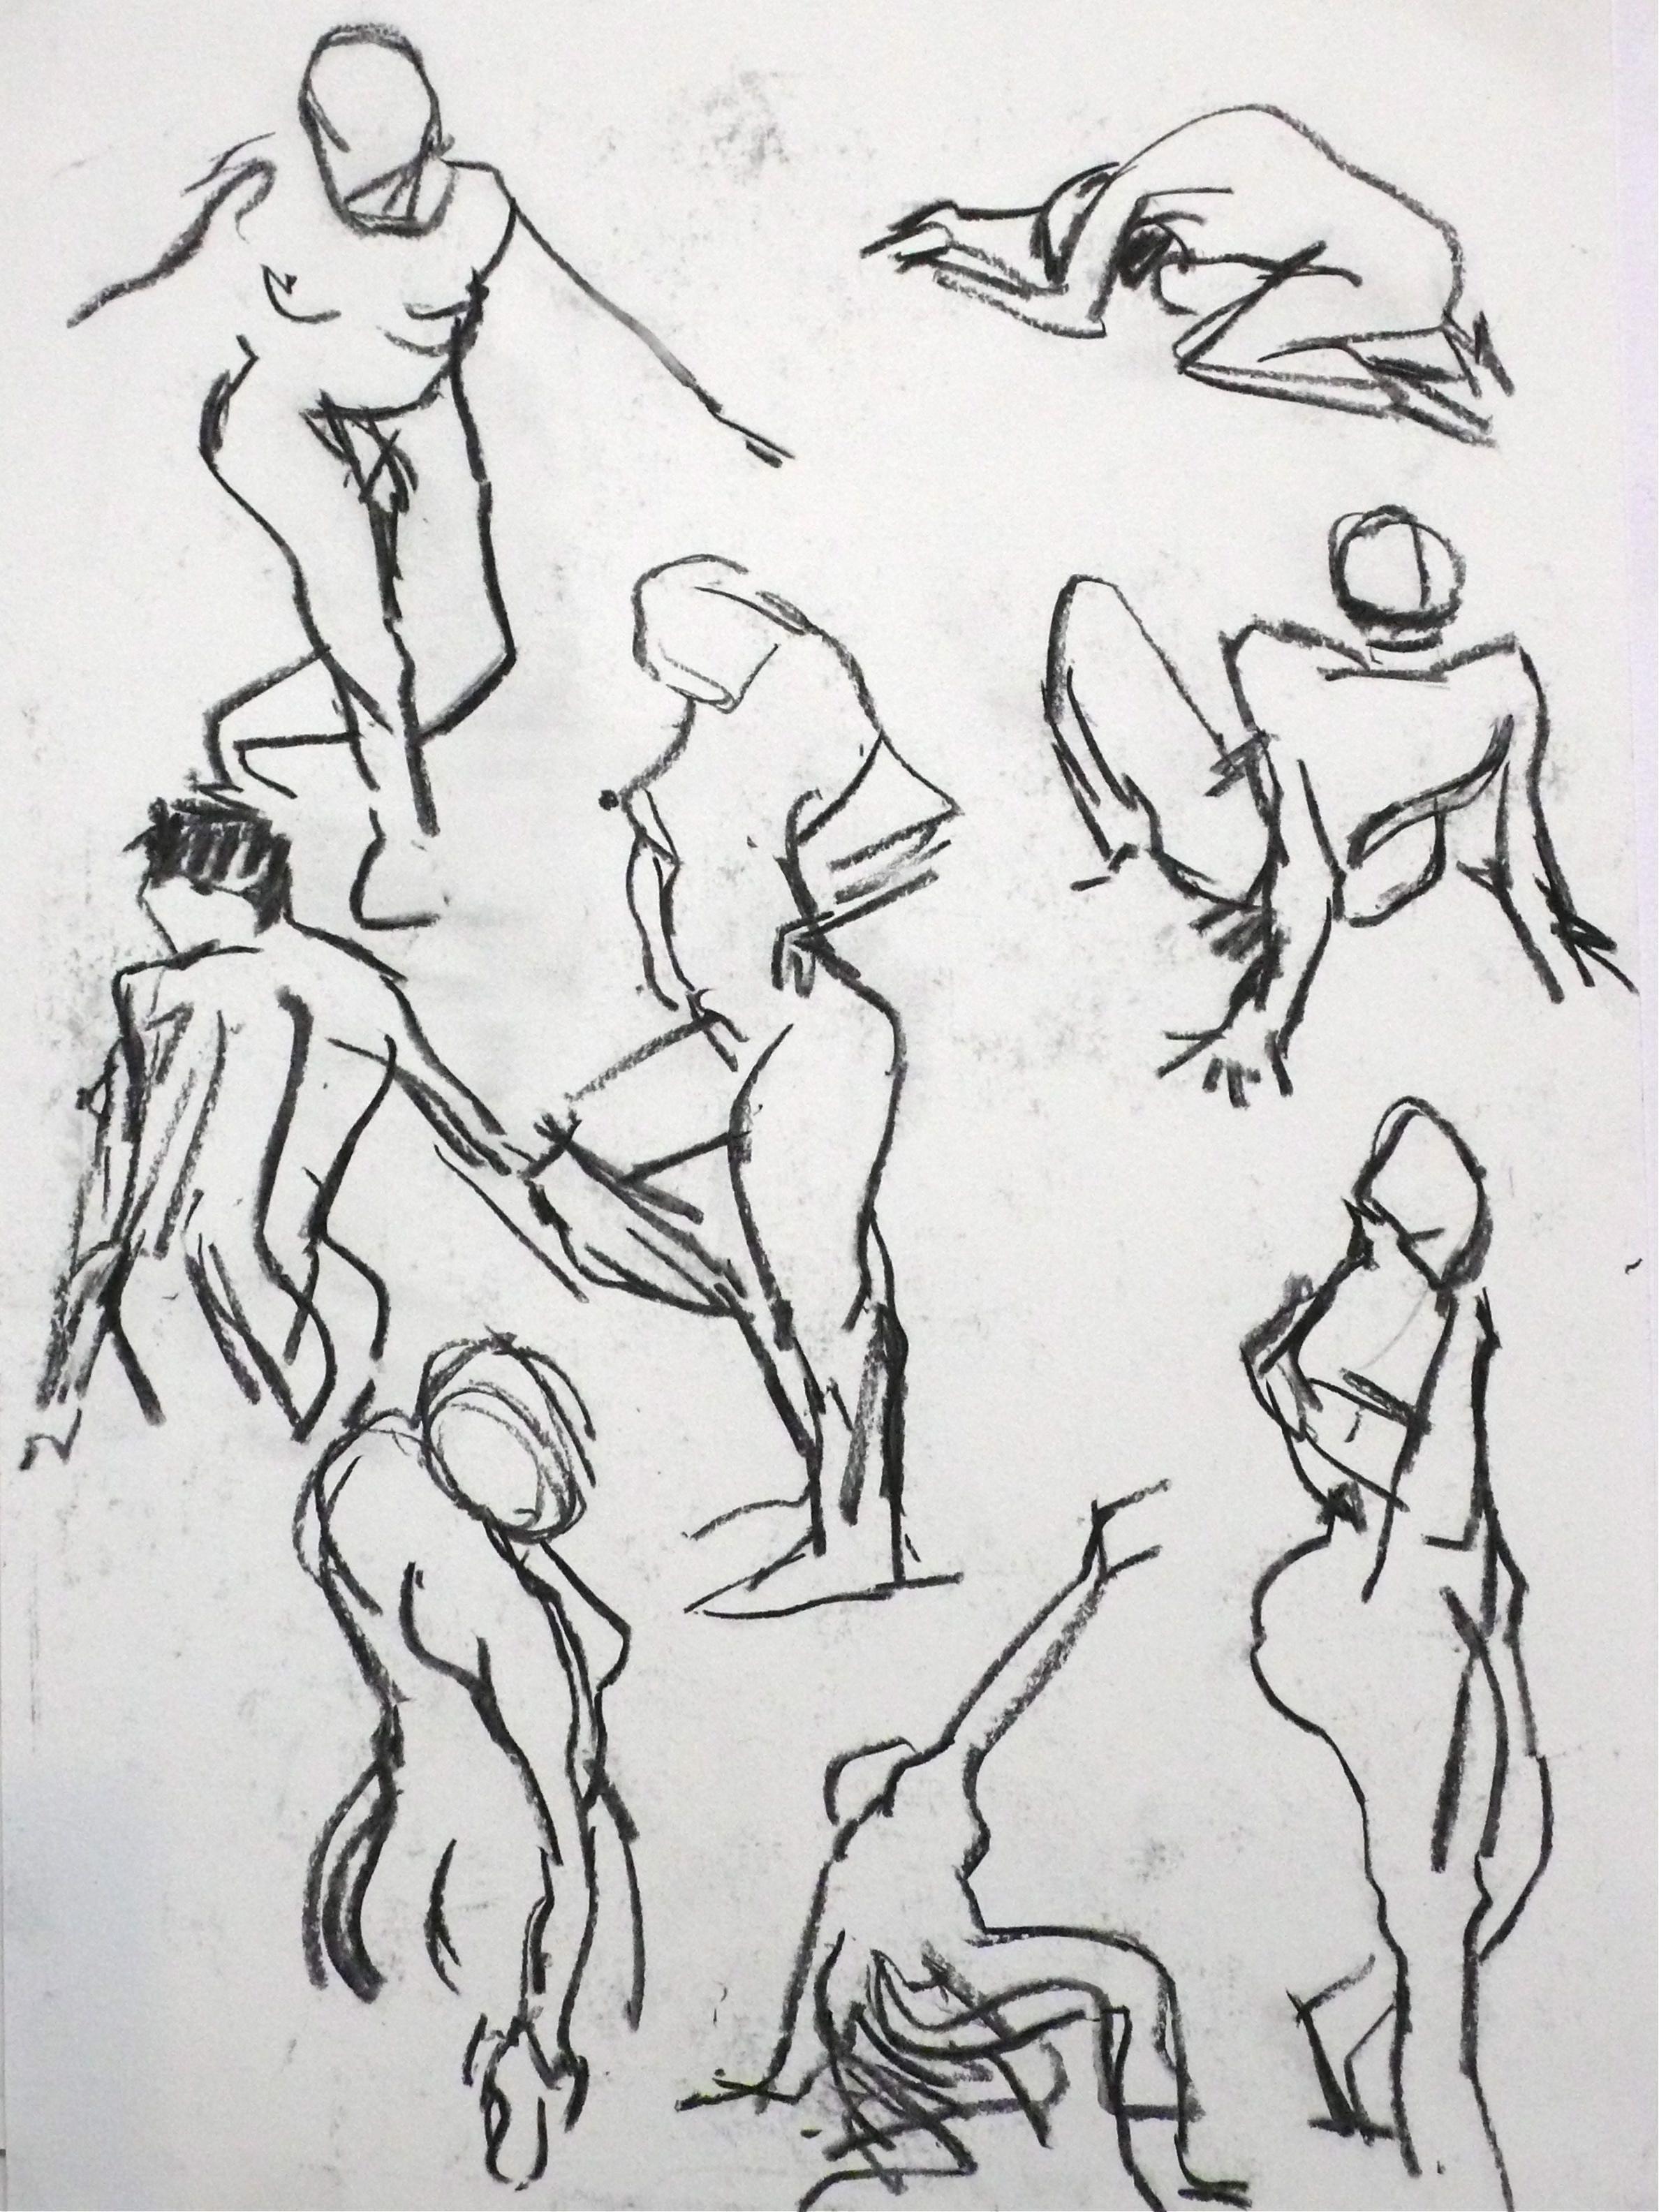 29-june-one-minute-sketches_2756764332_o.jpg